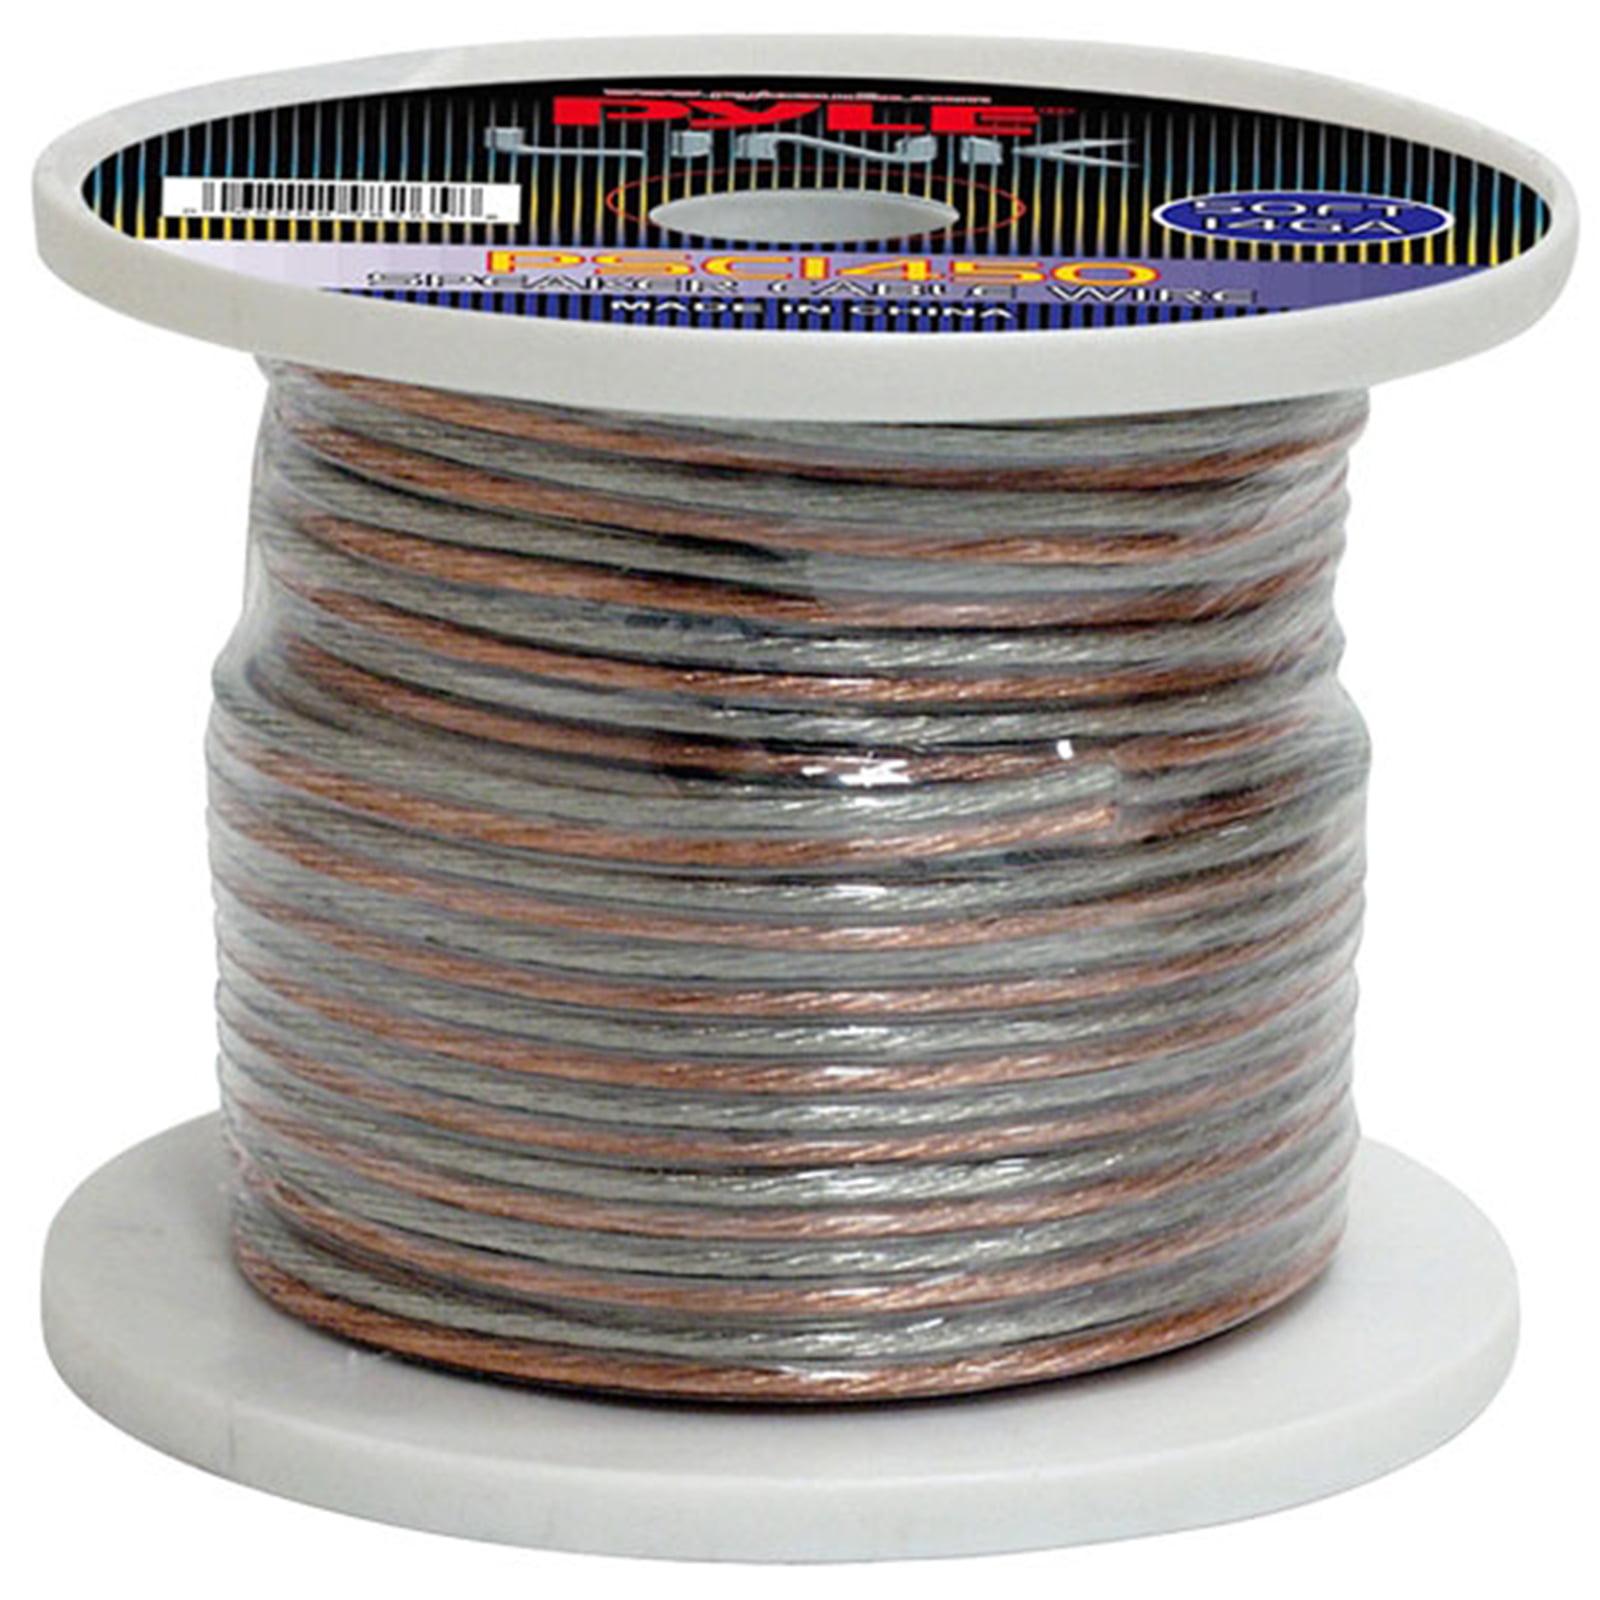 14 Gauge 50 ft. Spool of High Quality Speaker Zip Wire